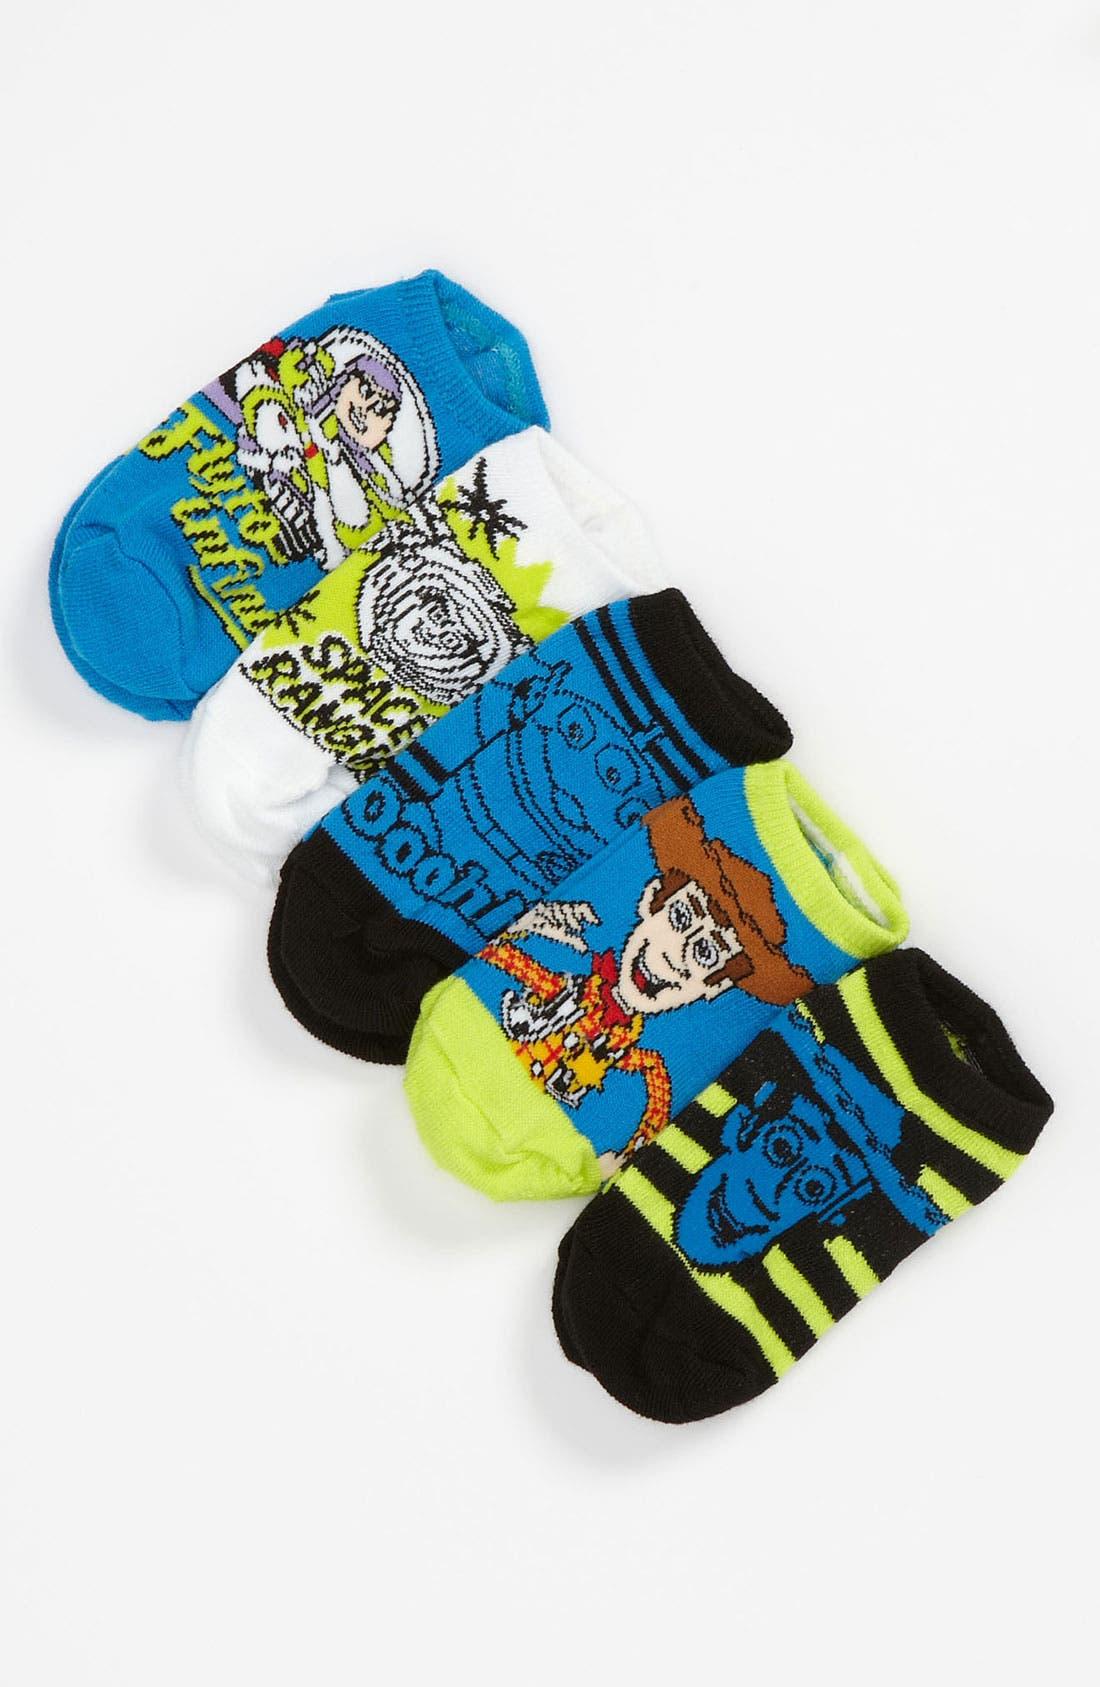 Alternate Image 1 Selected - Disney 'Toy Story®' Print Socks (5-Pack) (Walker & Toddler)